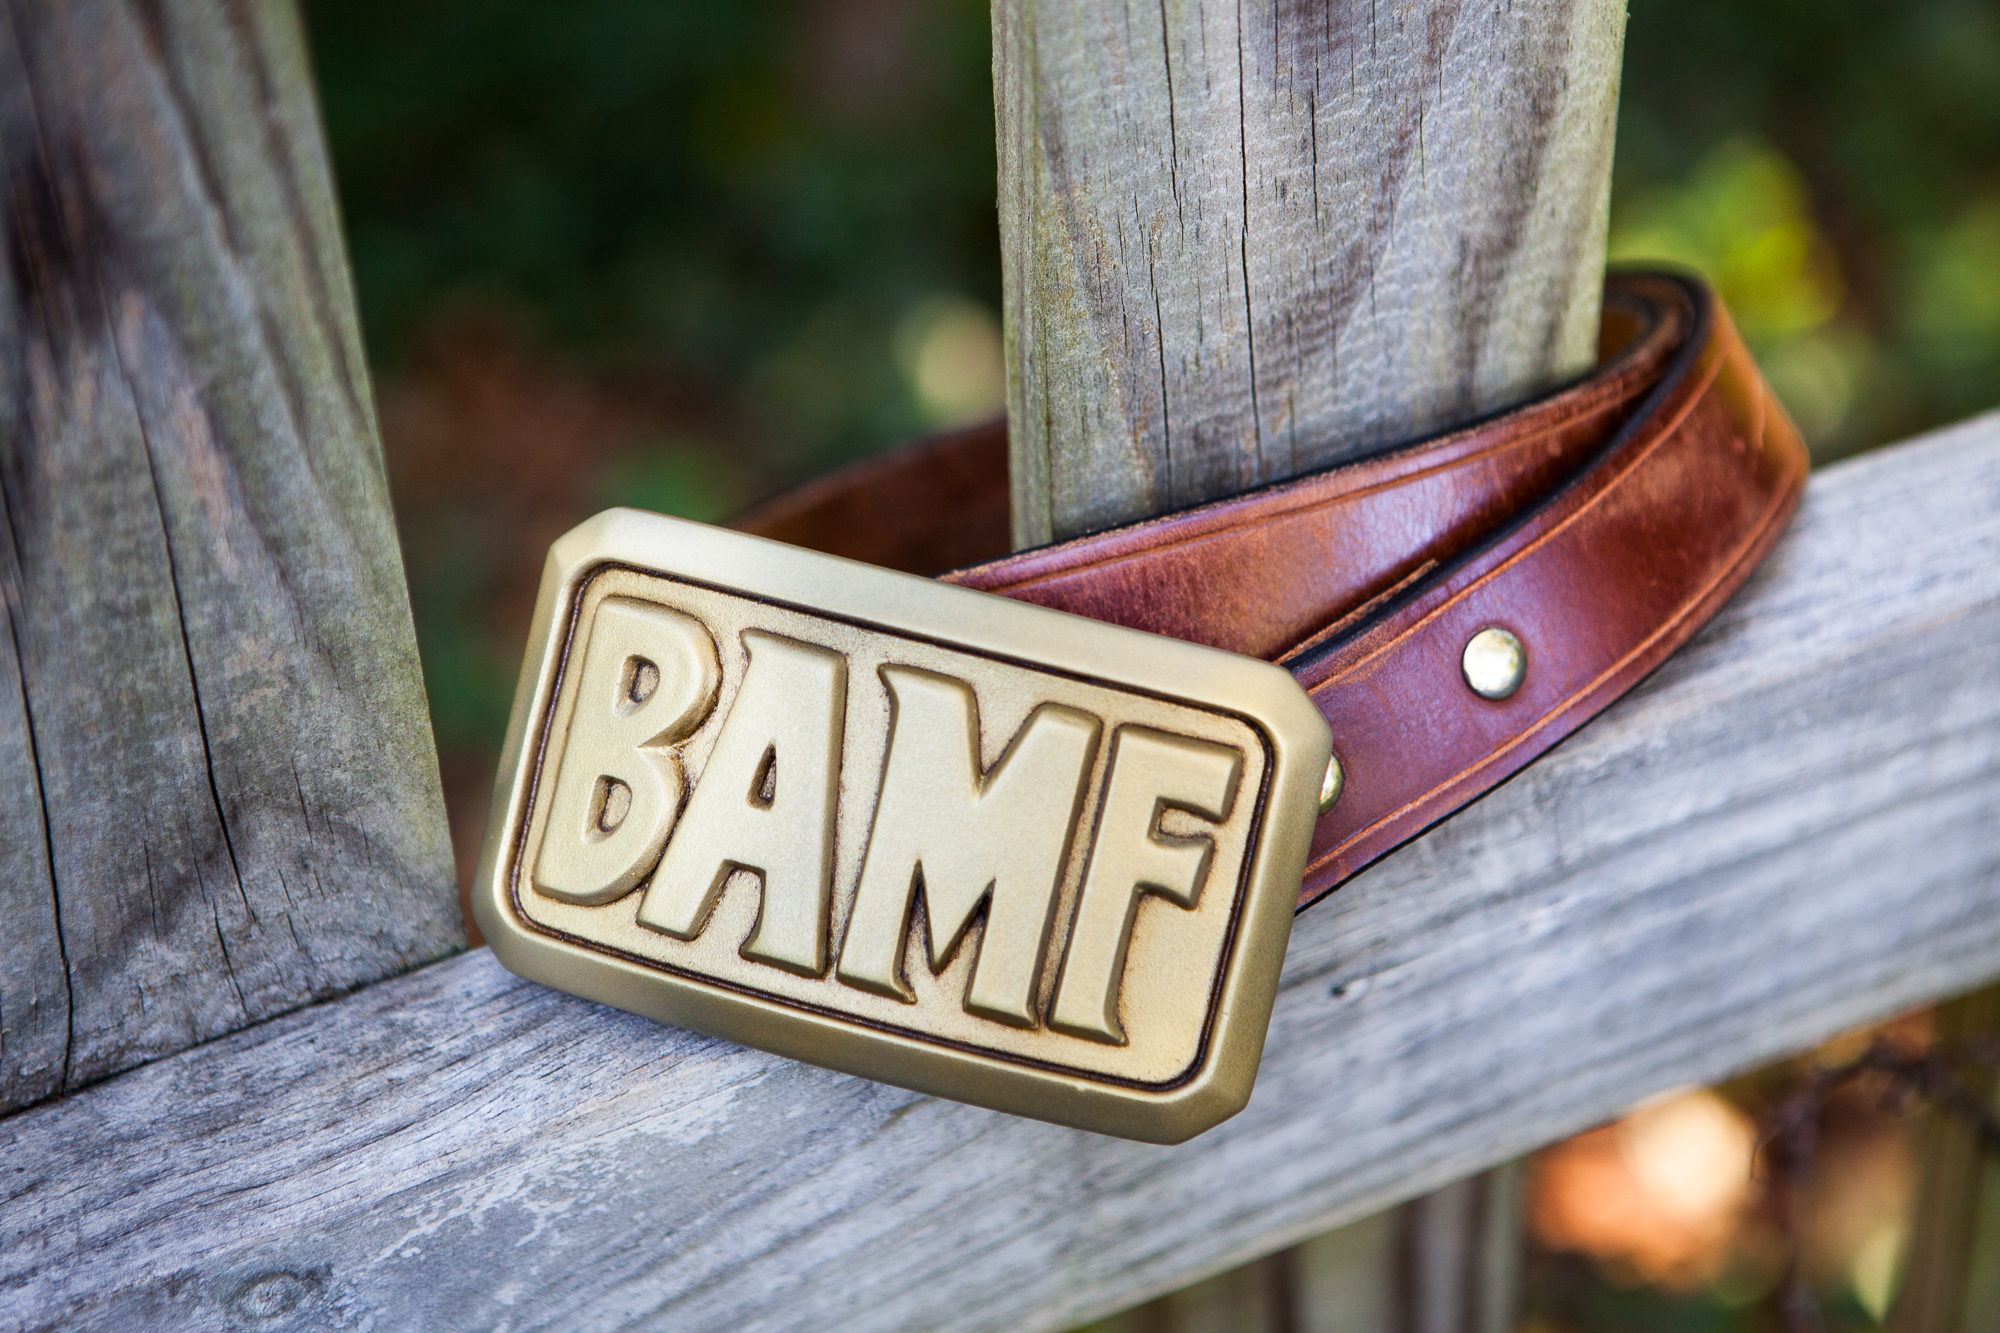 McCree's Belt Buckle: Conclusion